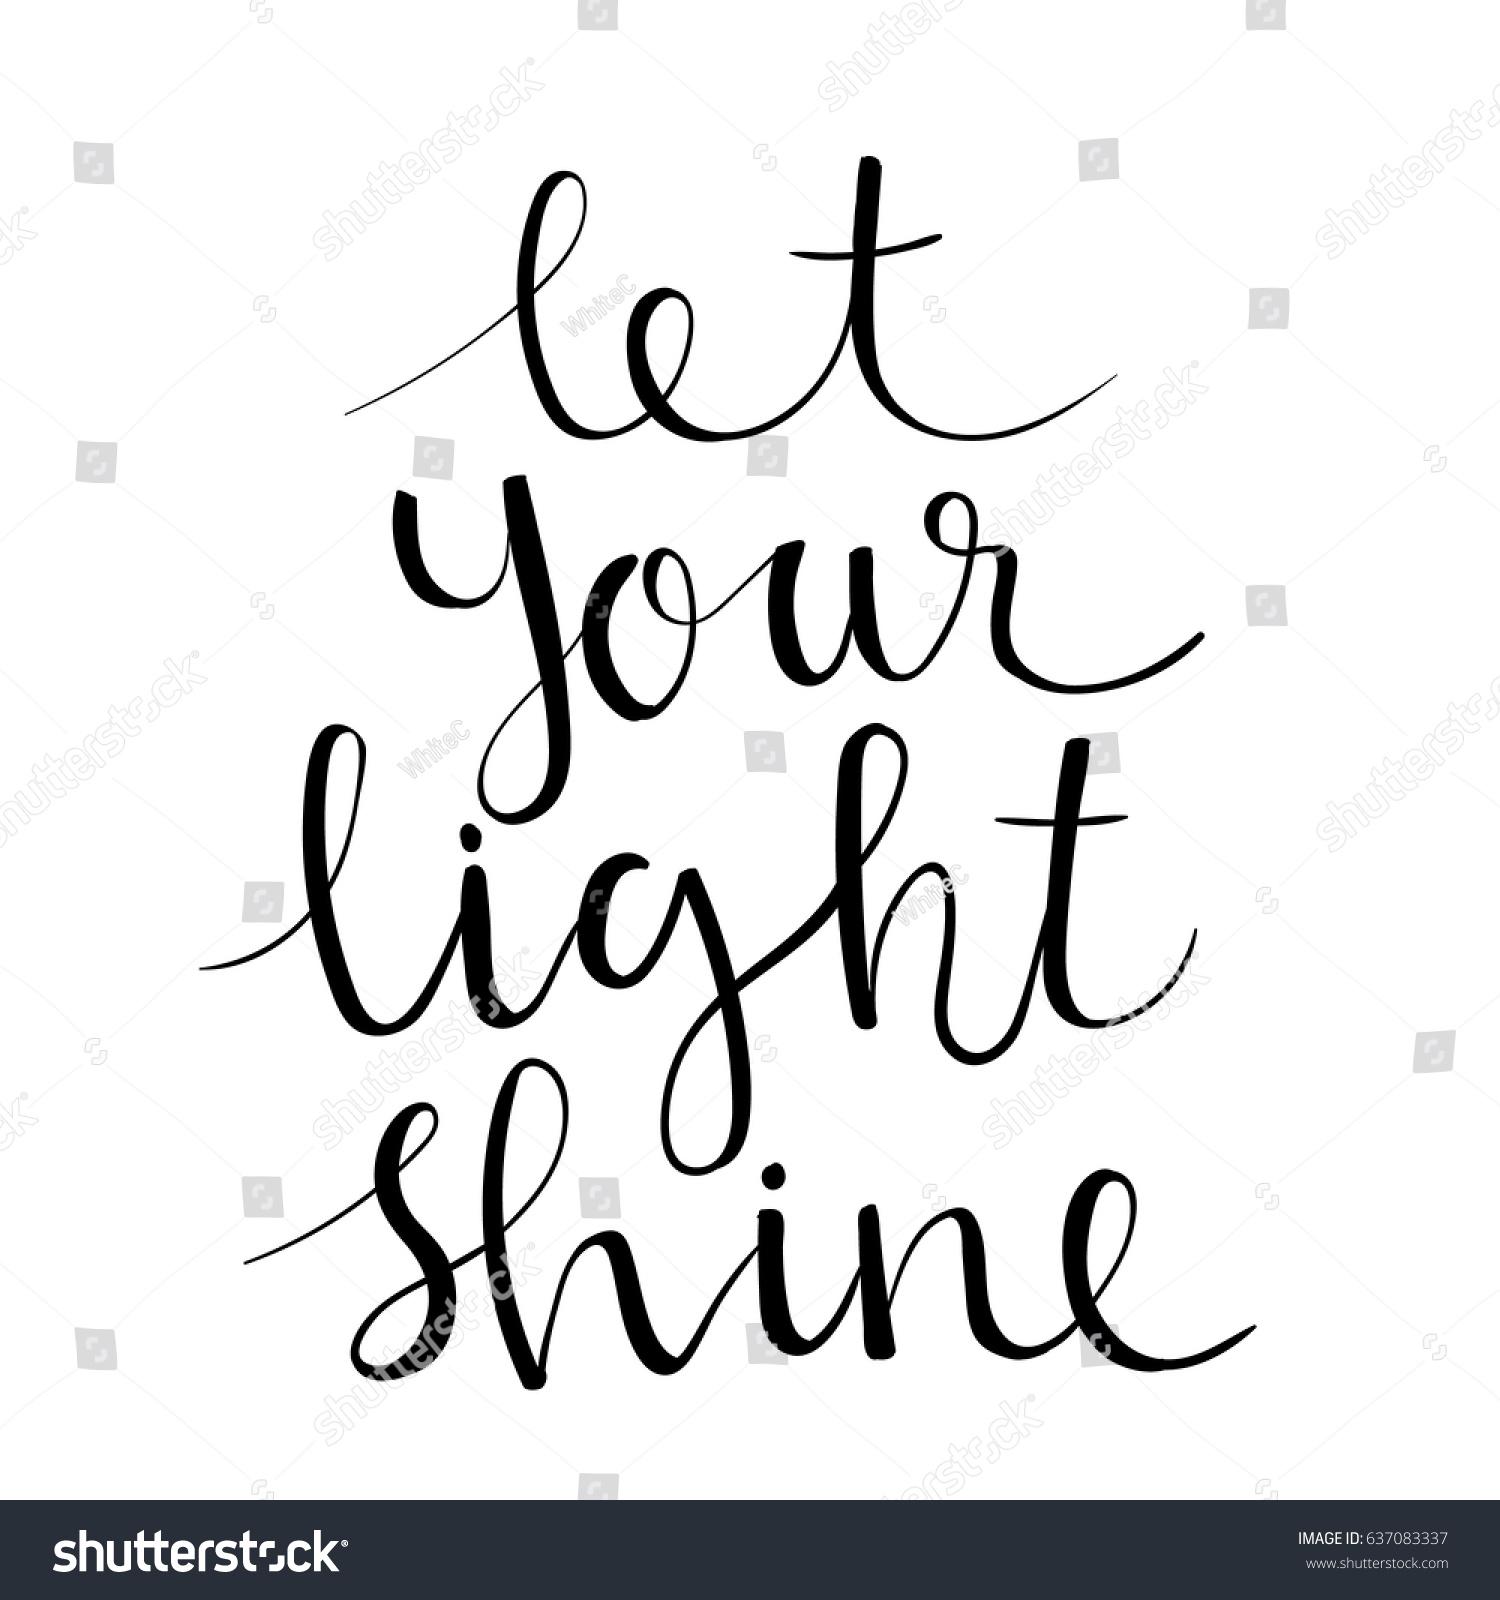 Let your light shine modern calligraphy stock vector